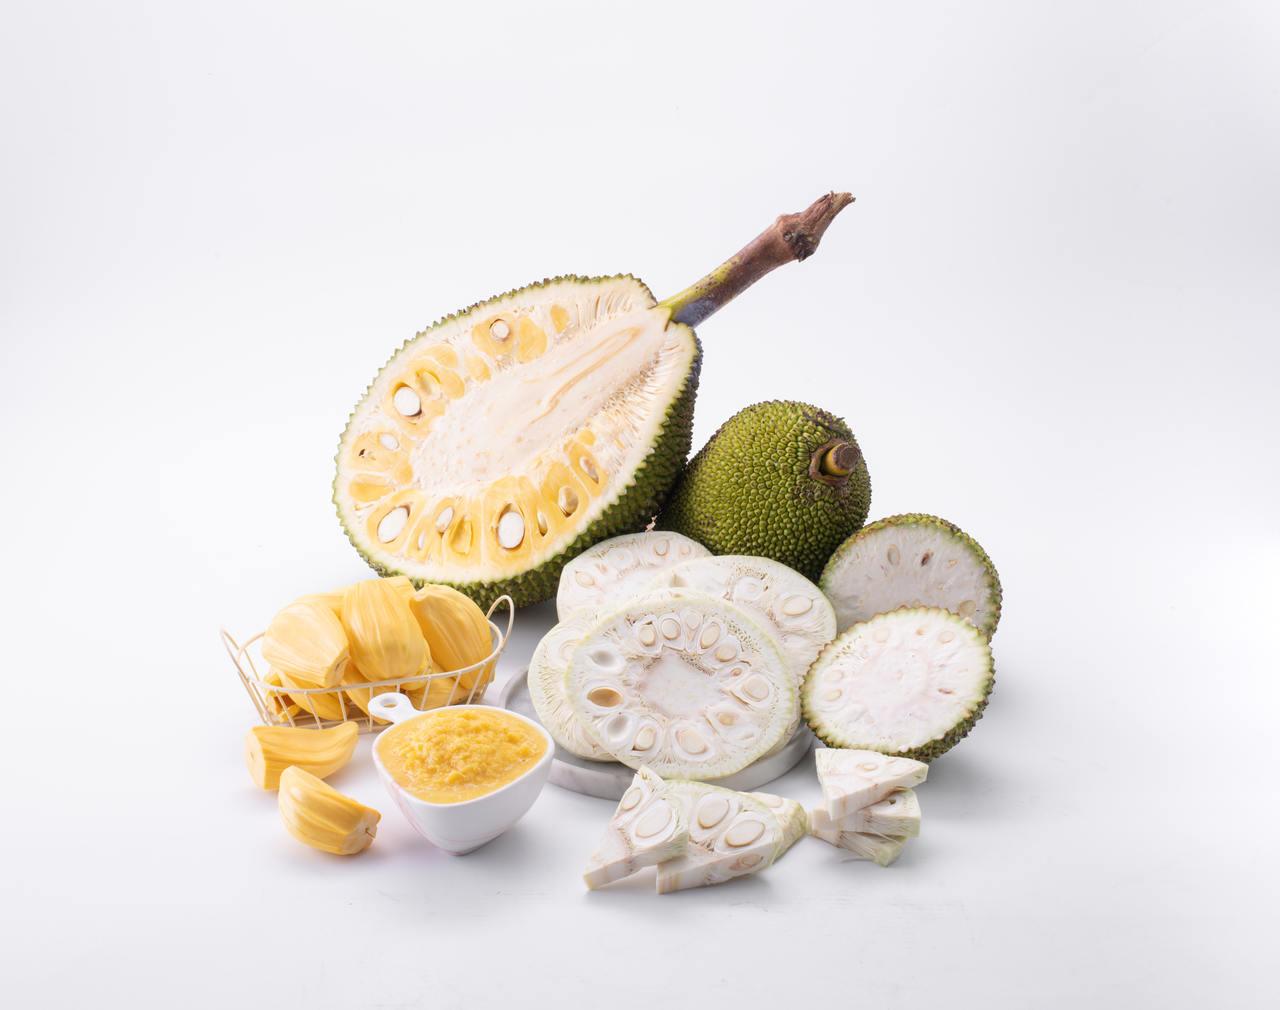 Thakolsri Farm - Frozen Jackfruit